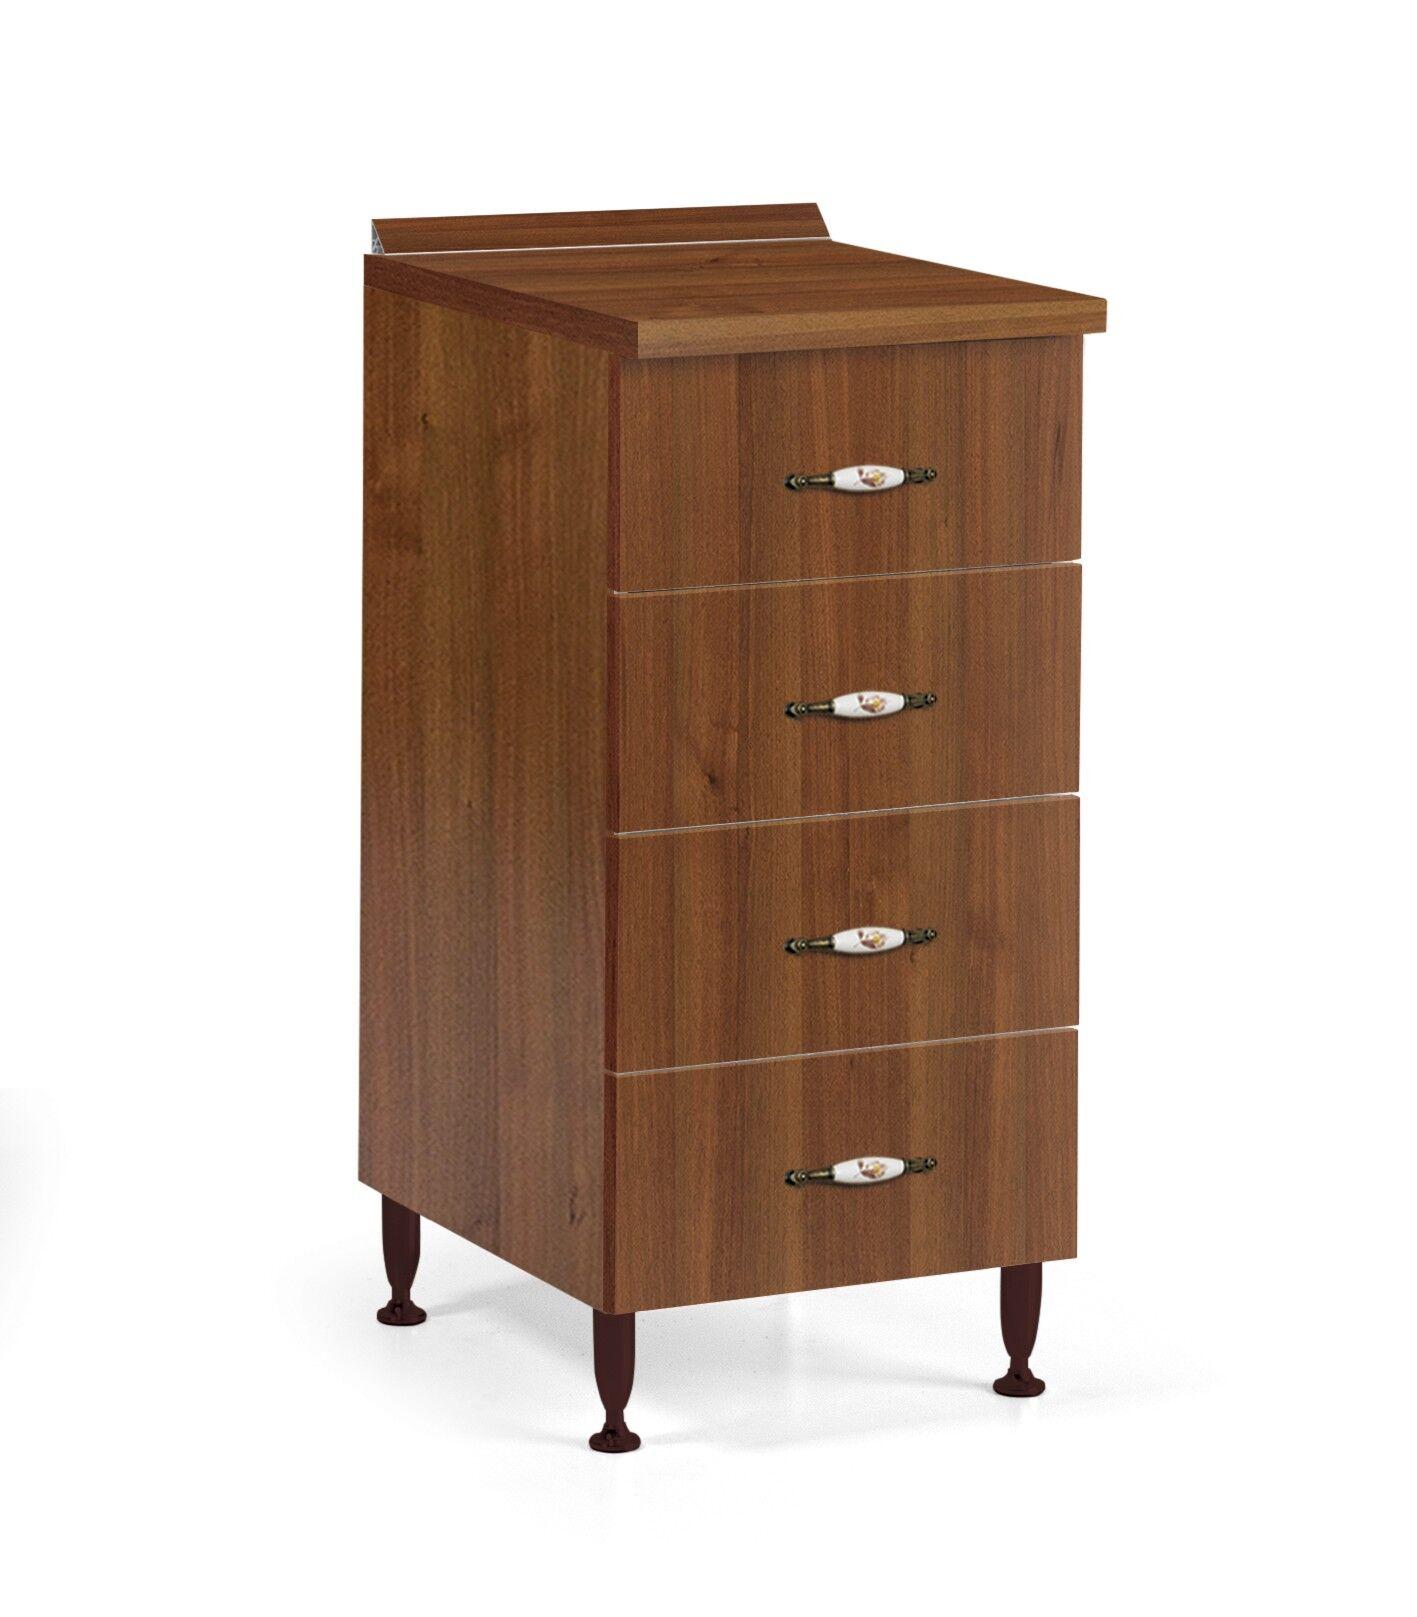 caesaroo base cassettiera cucina 40x50xh85 in legno noce antico   noce